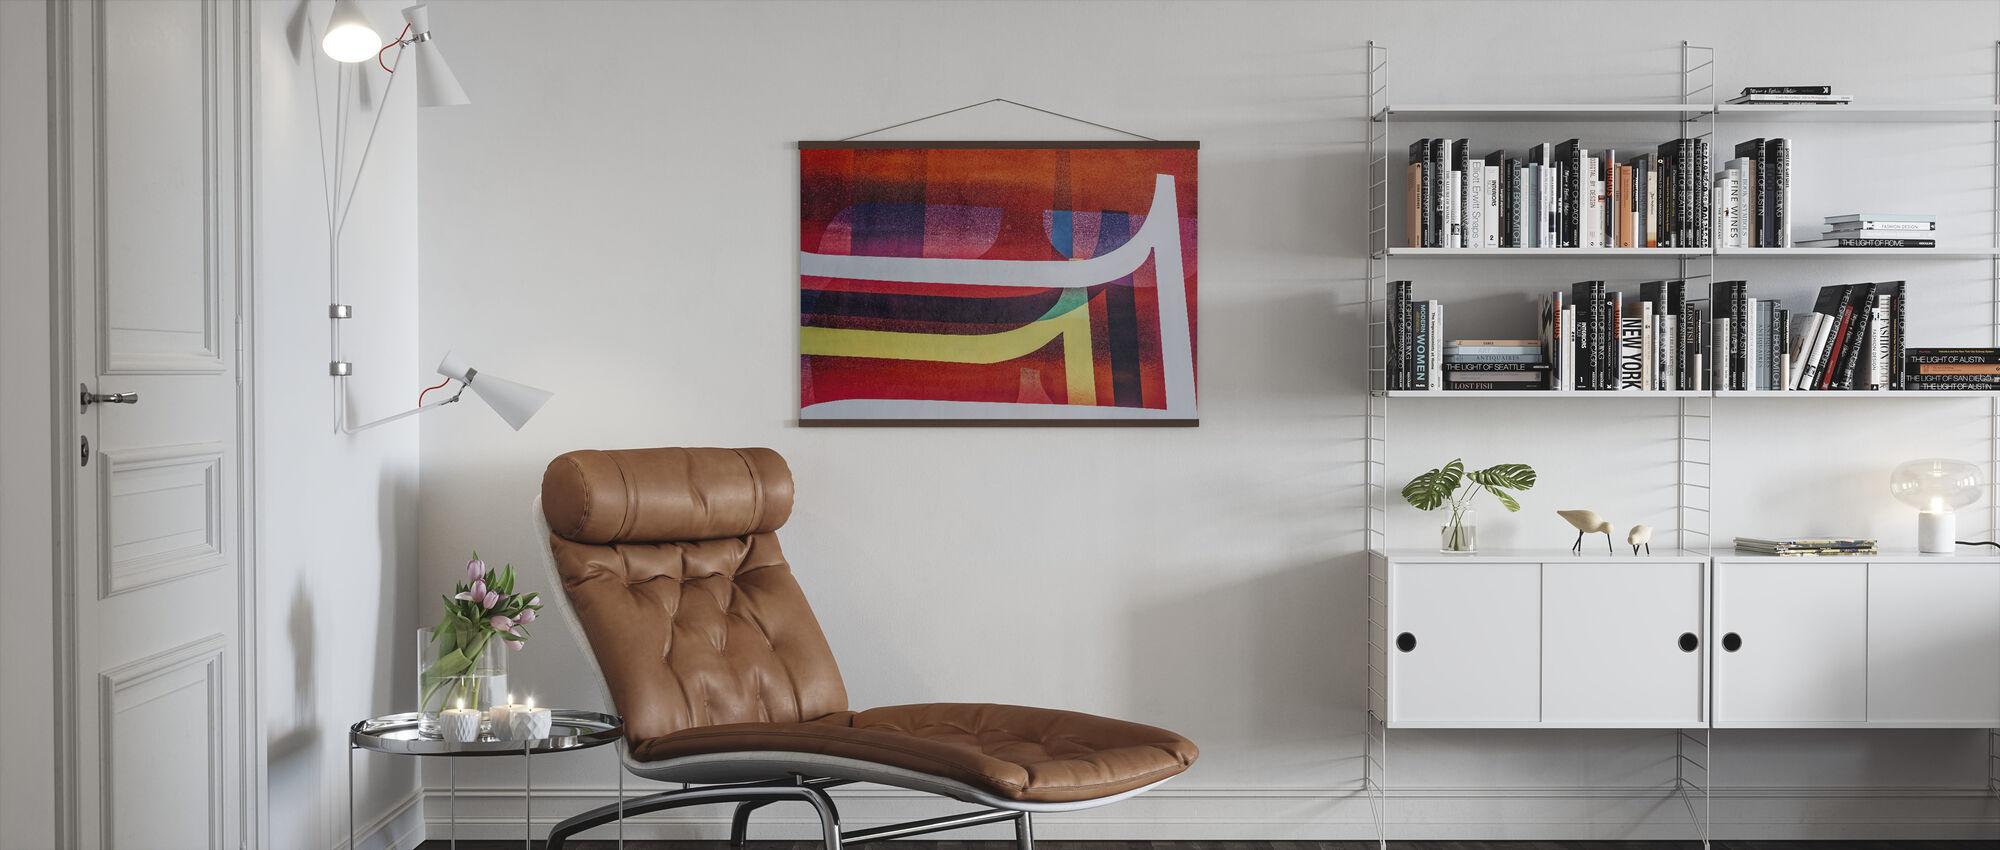 Visual Art - Poster - Living Room